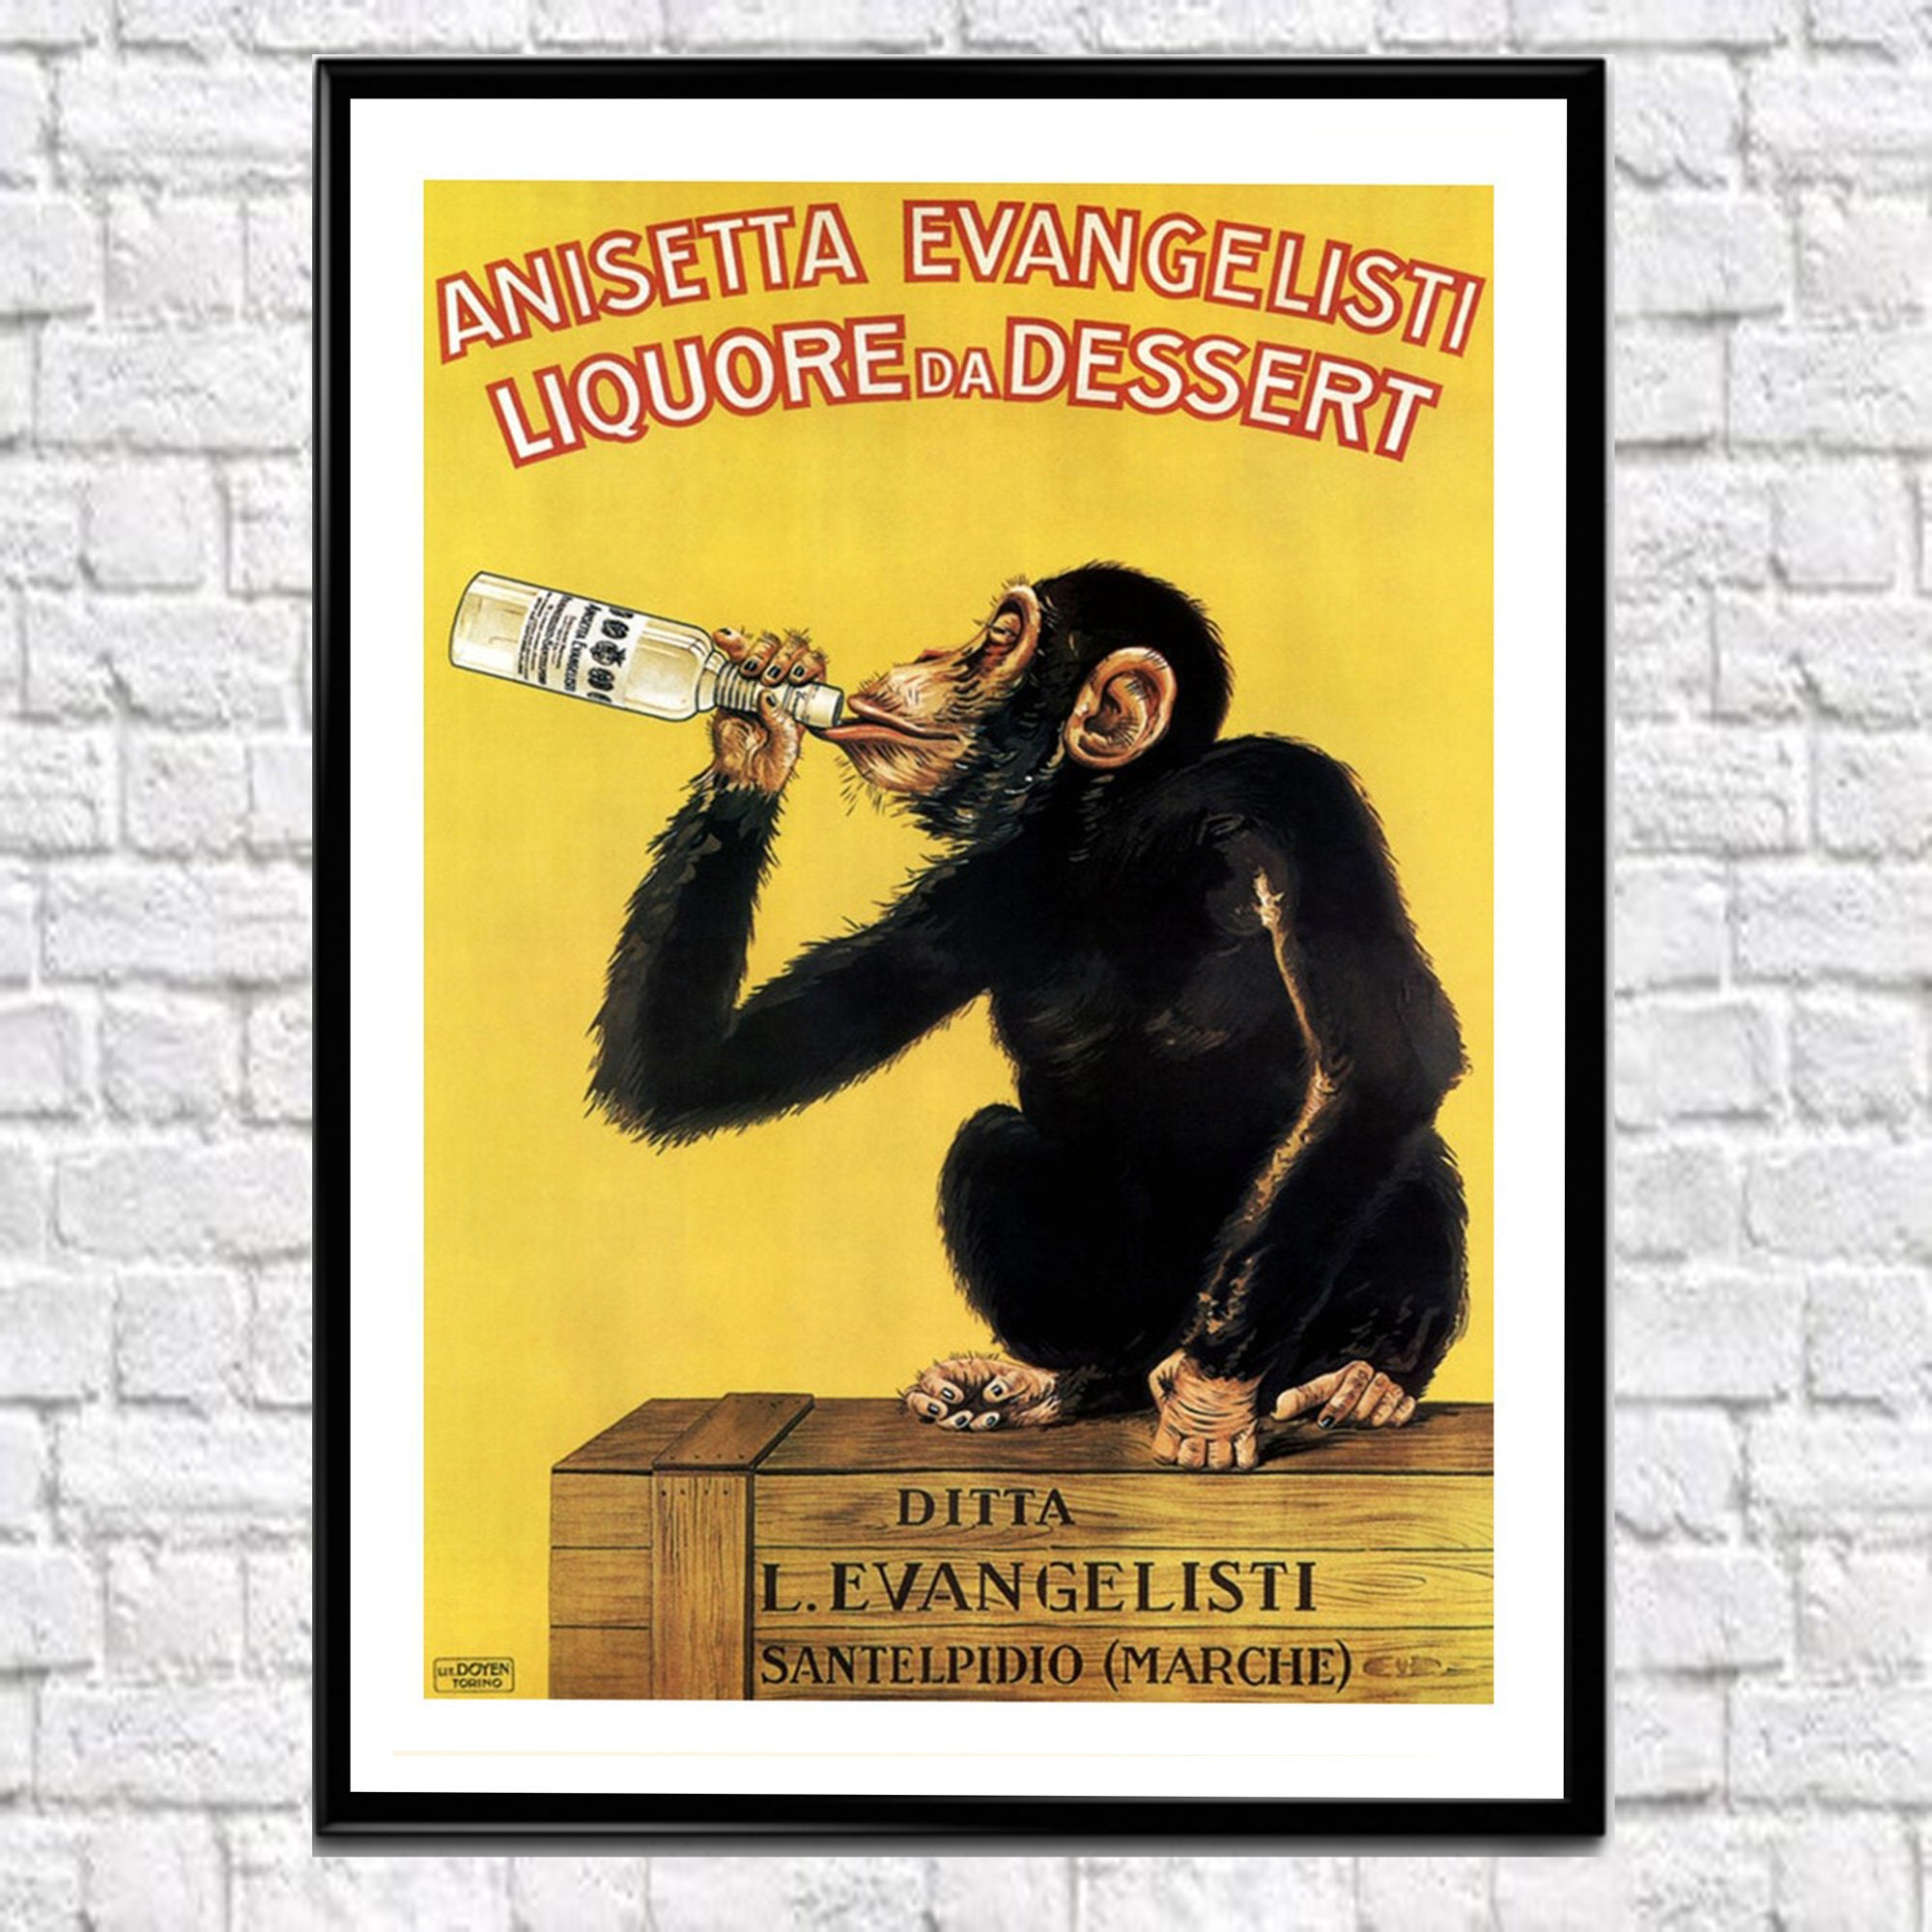 Funny Poster Humorous Poster Funny Wall Art Bar Wall Art Bar Decor ...